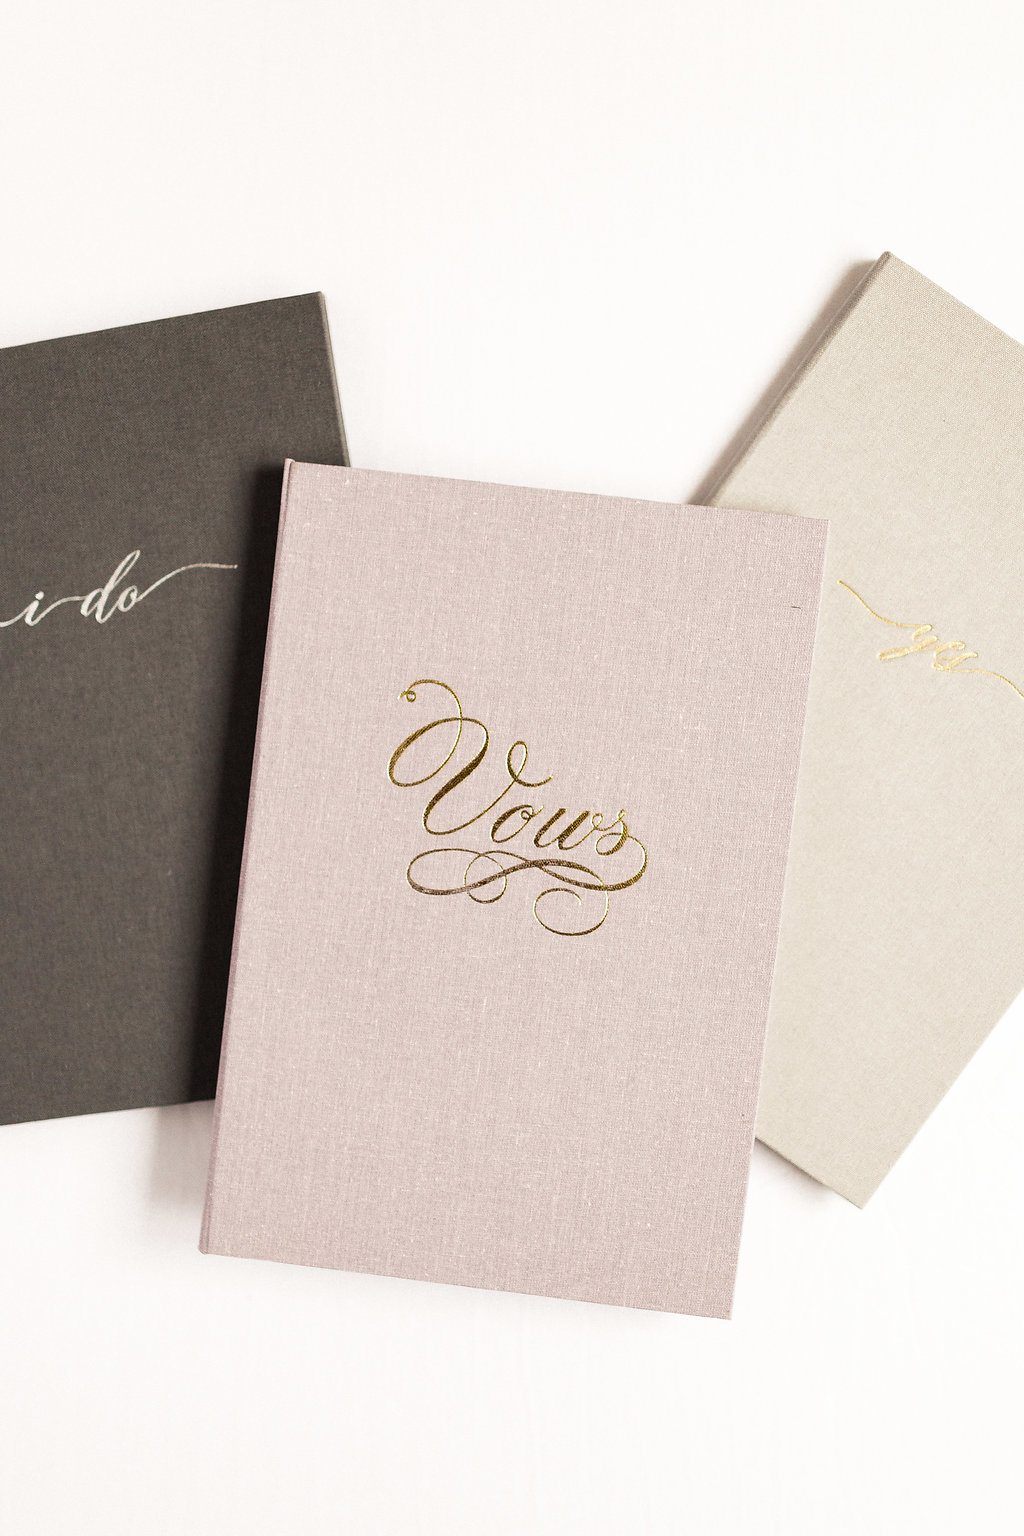 trio vow books wedding story writer